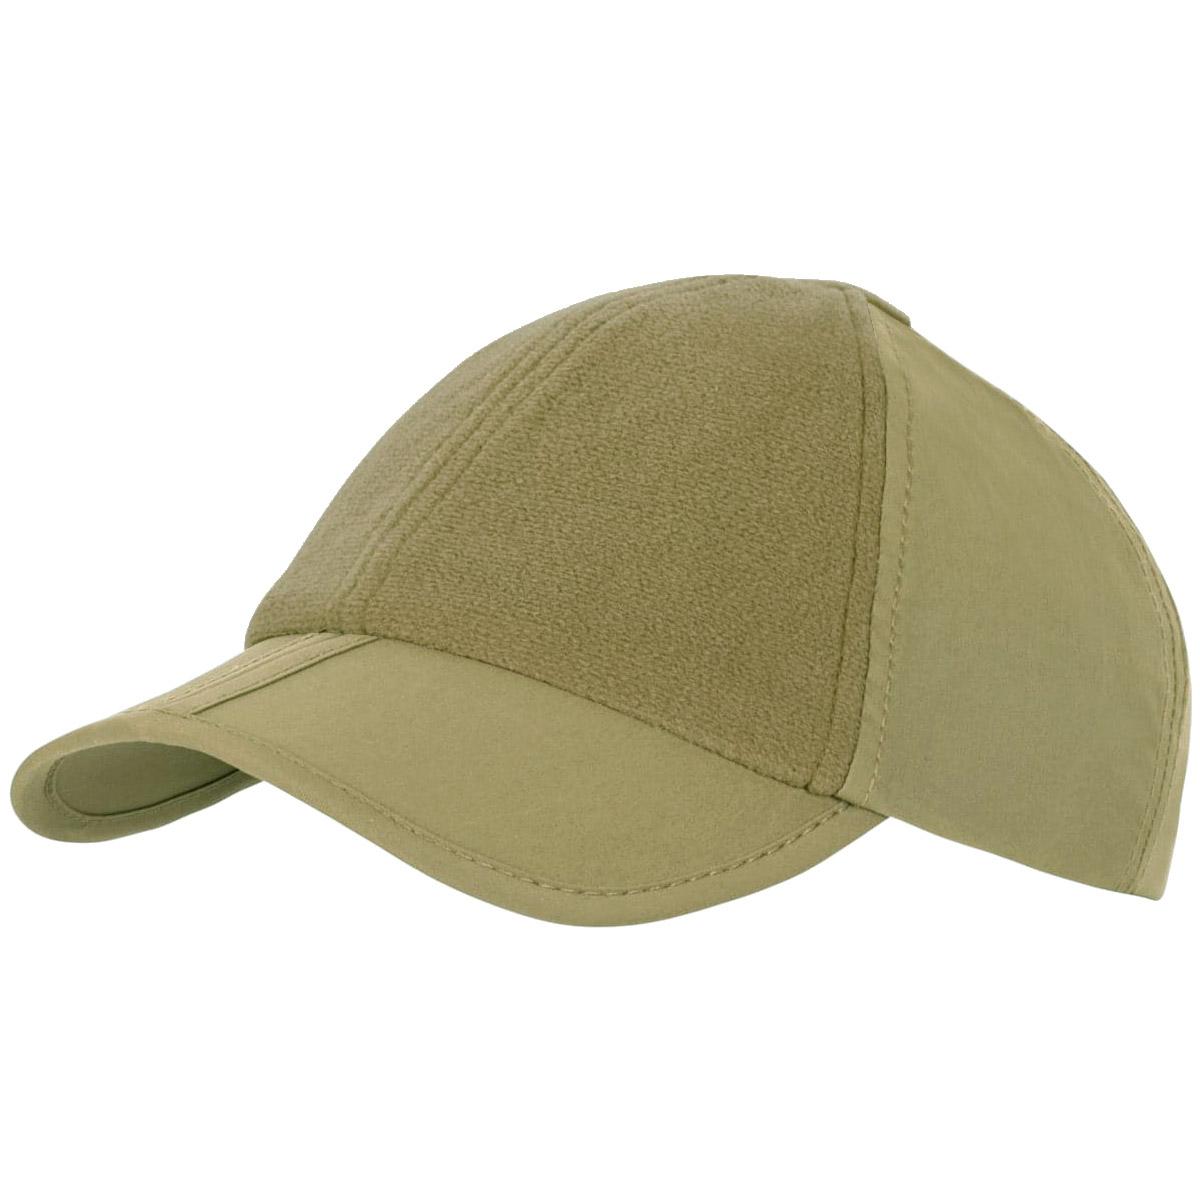 Helikon Mens Folding Baseball Outdoor Cap Tactical Military Hat Adaptive Green